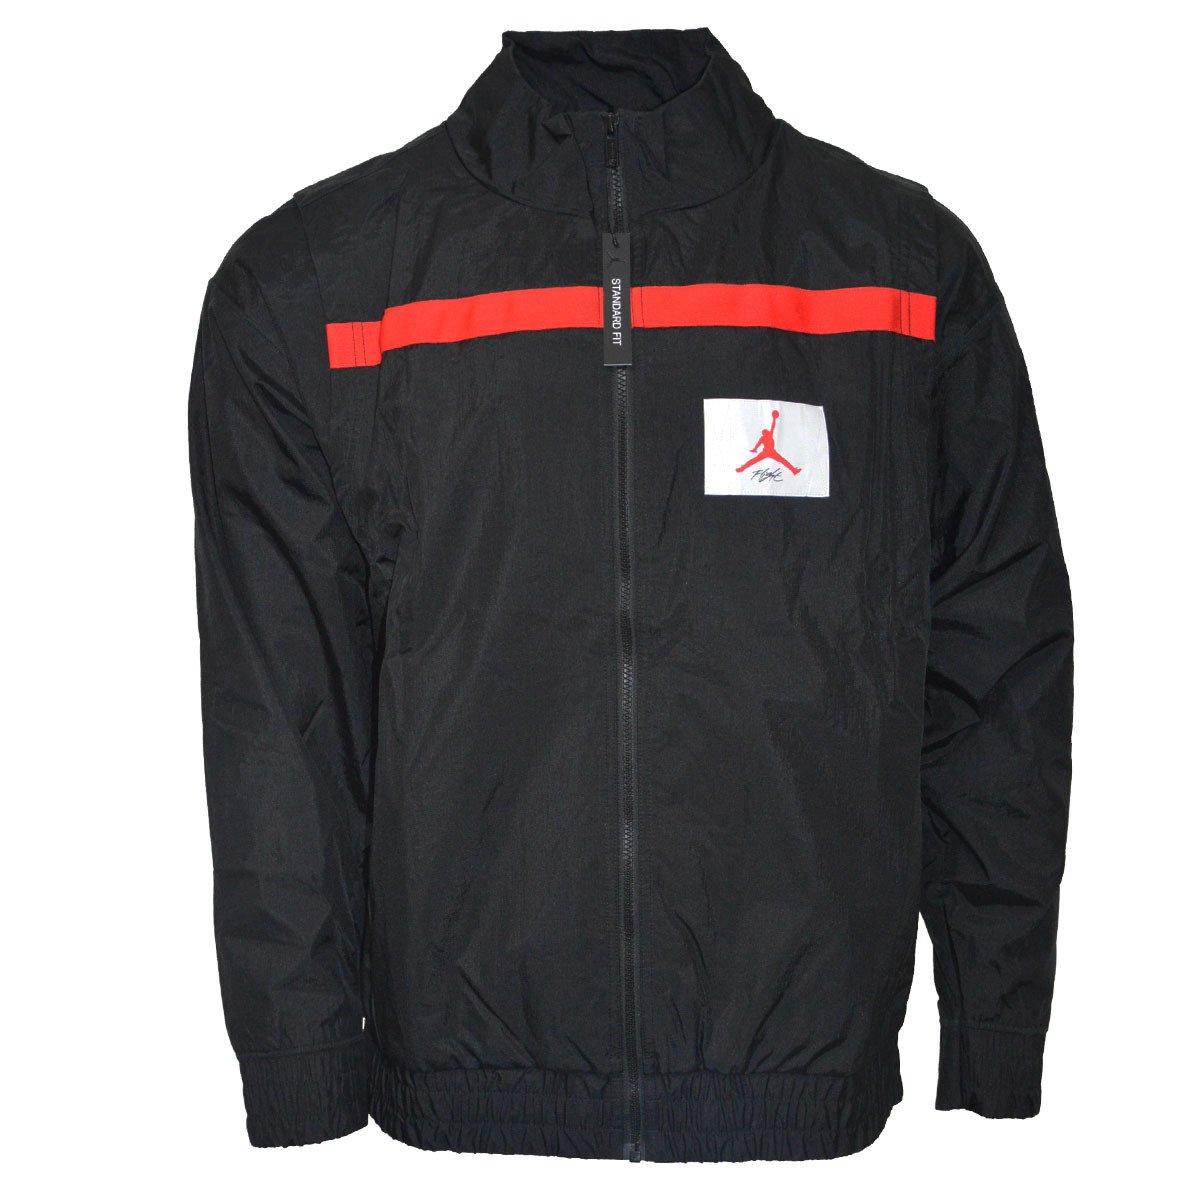 05a5ba2434f Air Jordan Flight Vault Jacket - AH3406-010 | Clothing \ Casual Wear \  Tracksuits | Sklep koszykarski Basketo.pl